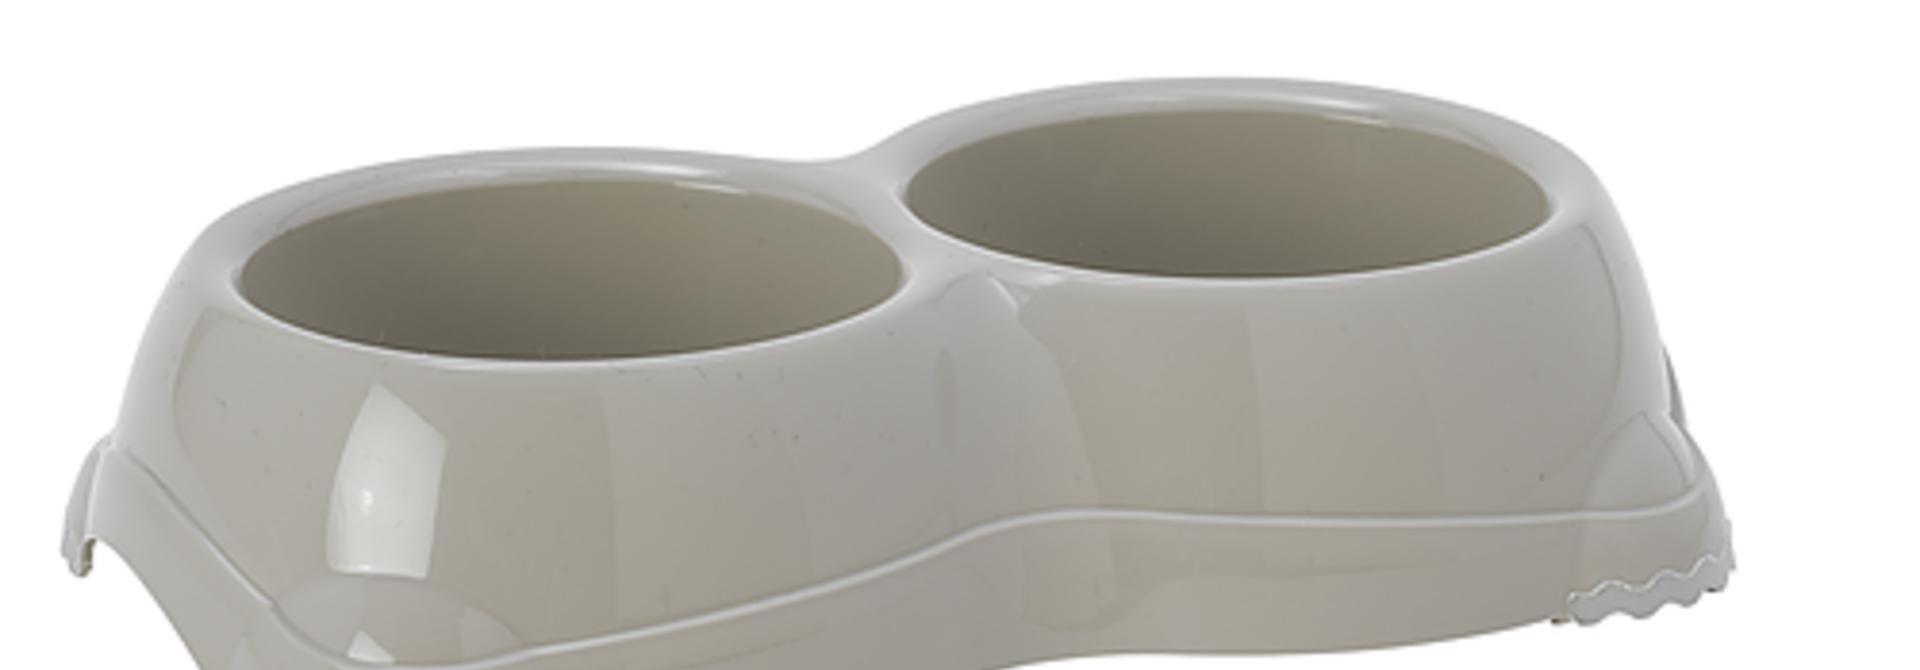 Double Smarty No-Slip Bowl -Small 11oz